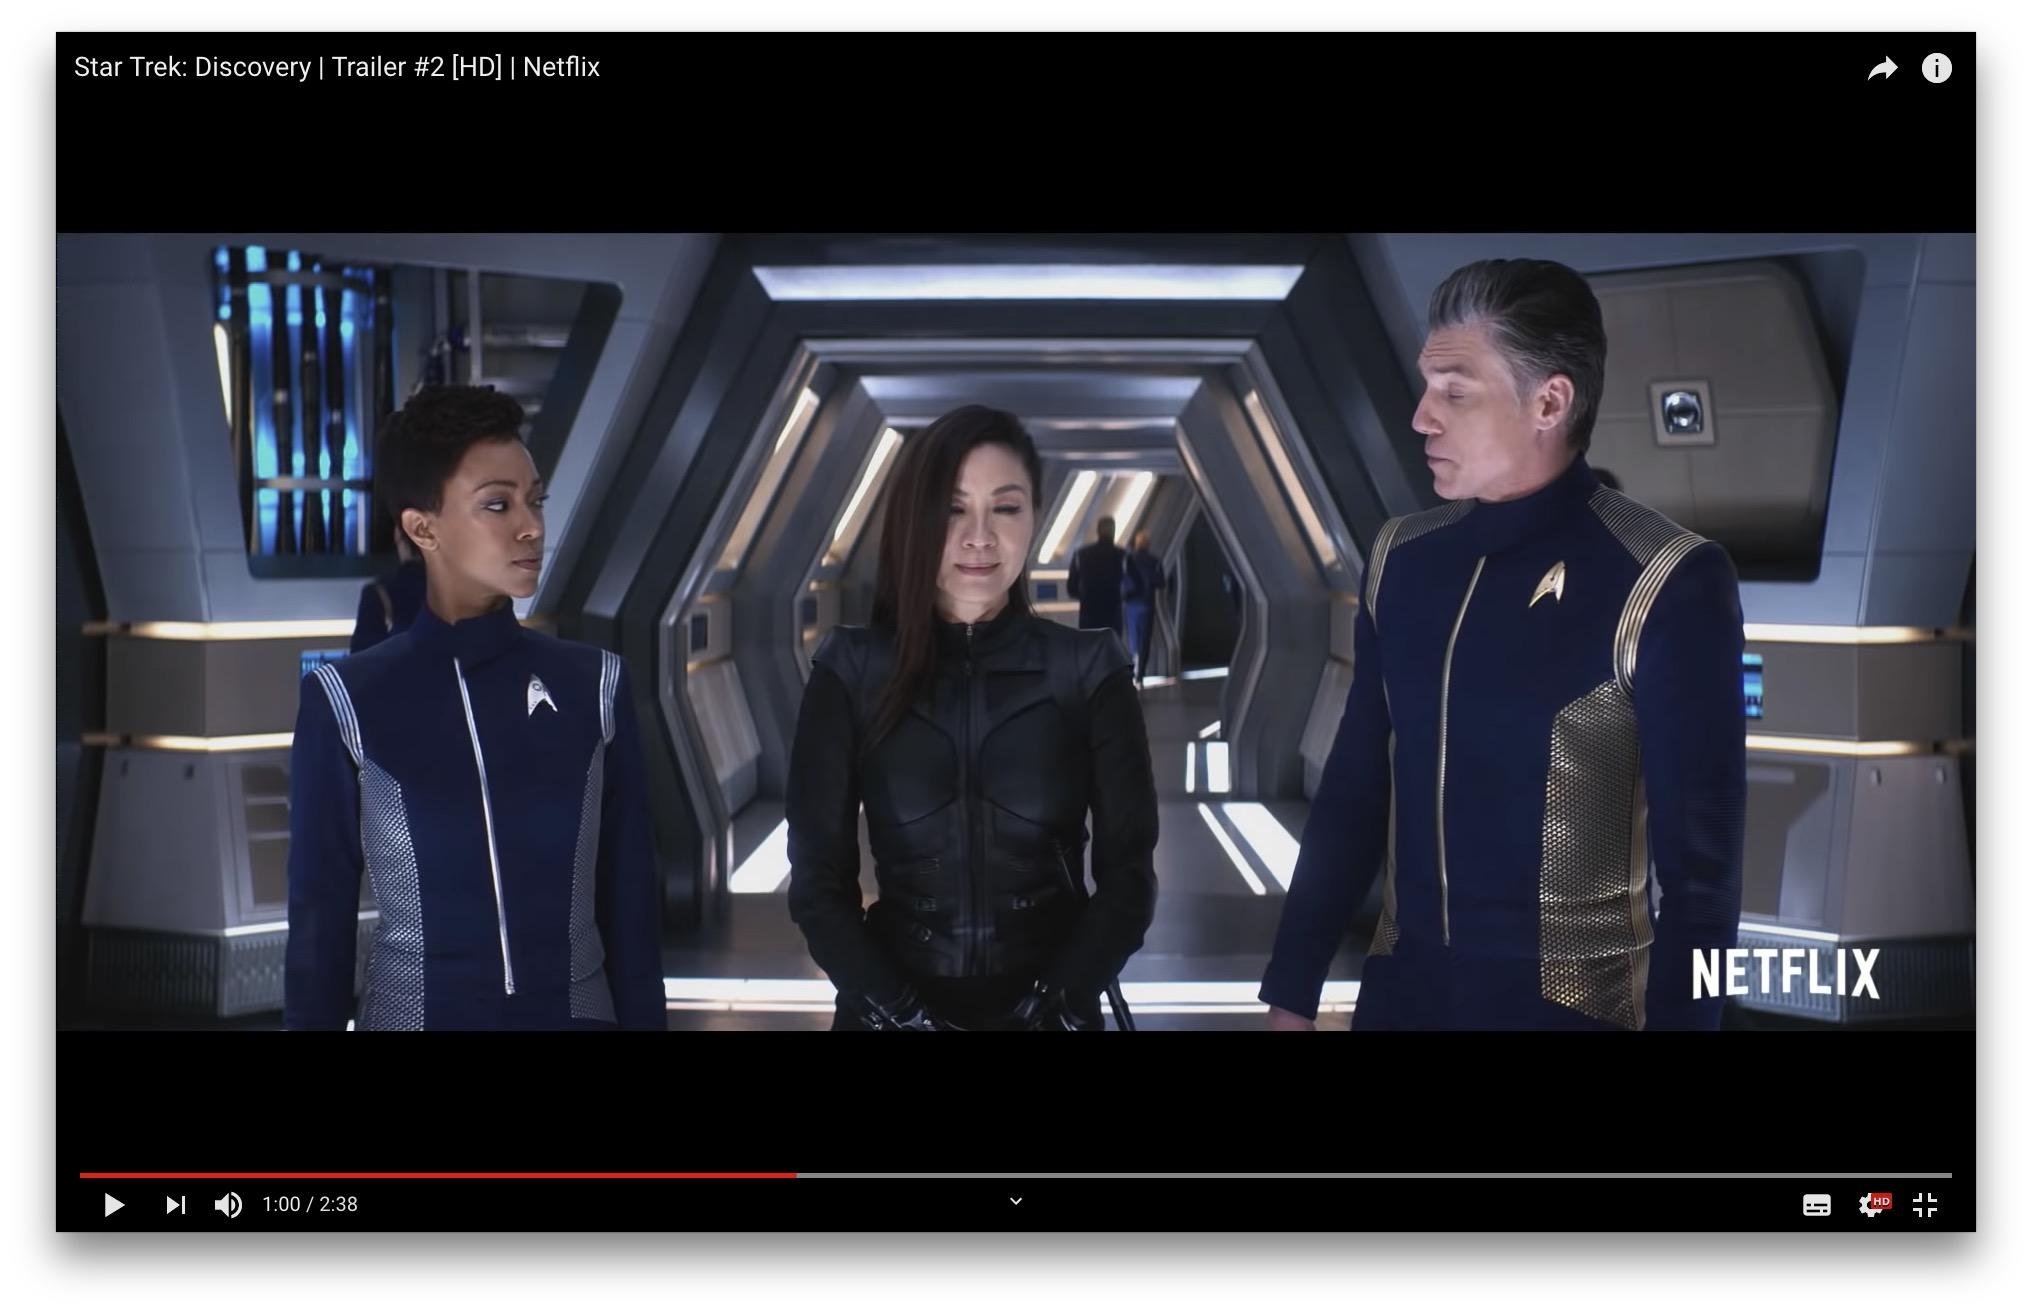 Star Trek: Discoveryのセカンドシーズンは2019年1月から